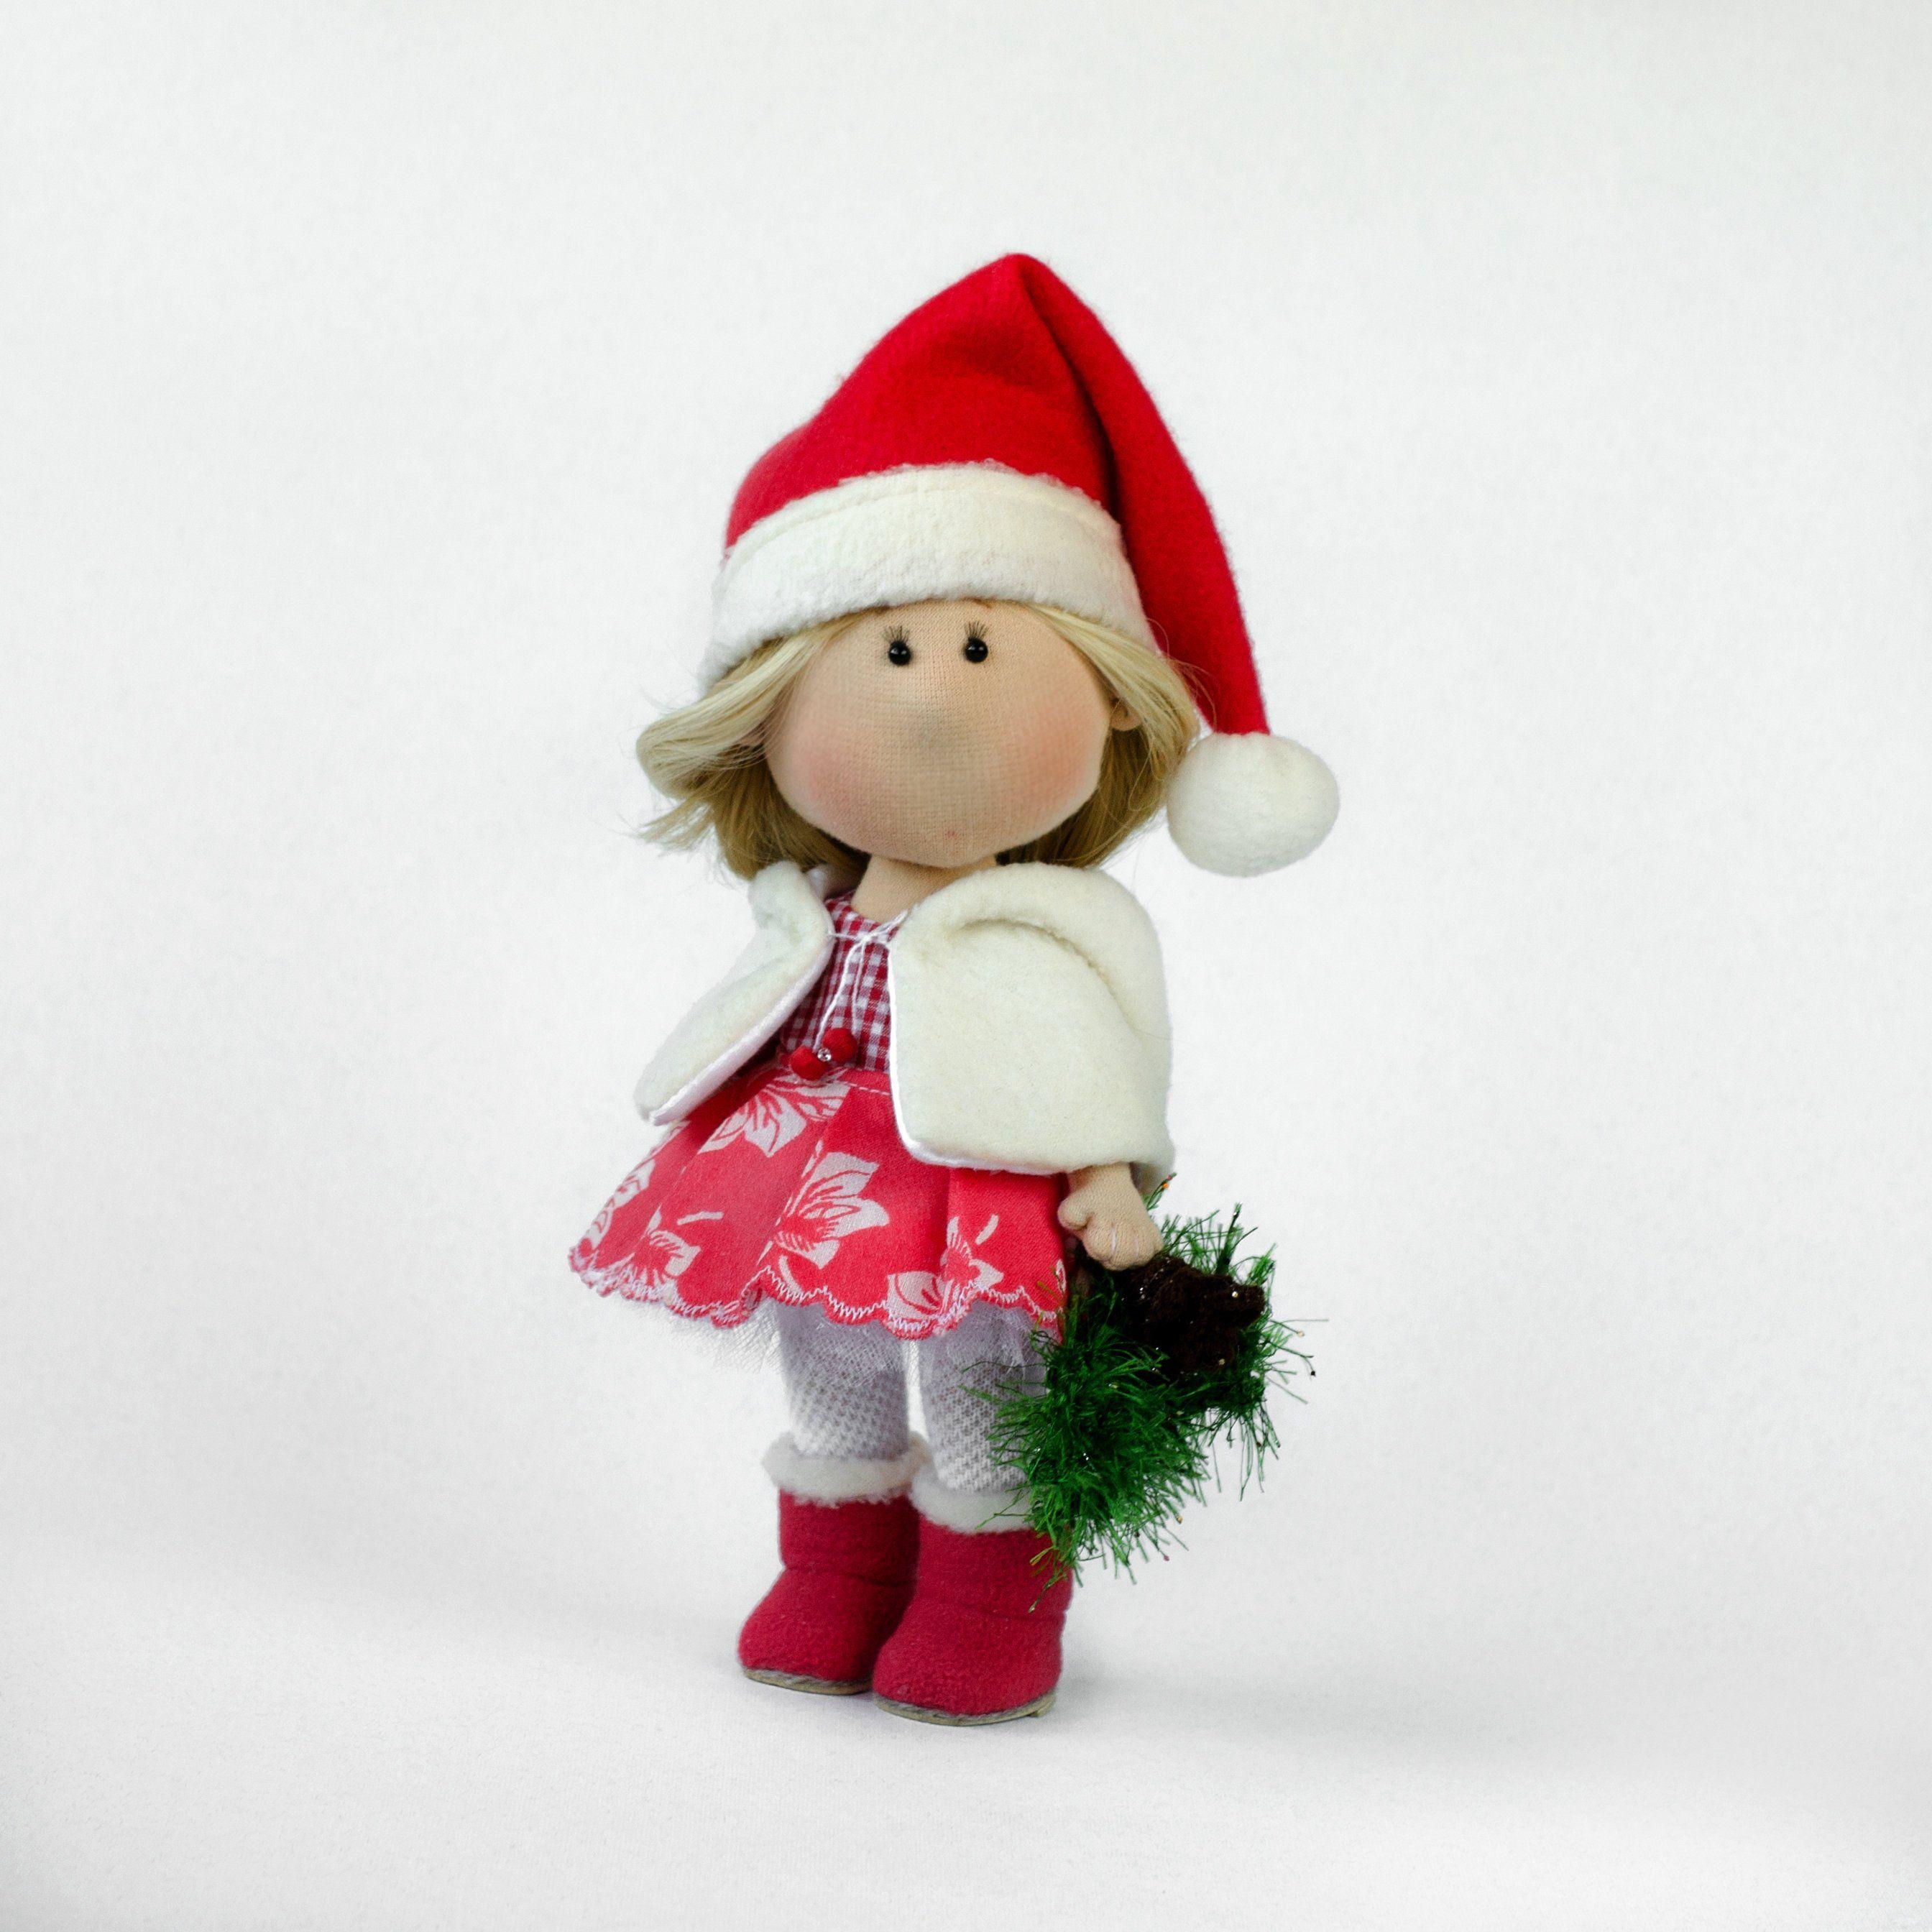 Handmade fabric doll Christmas